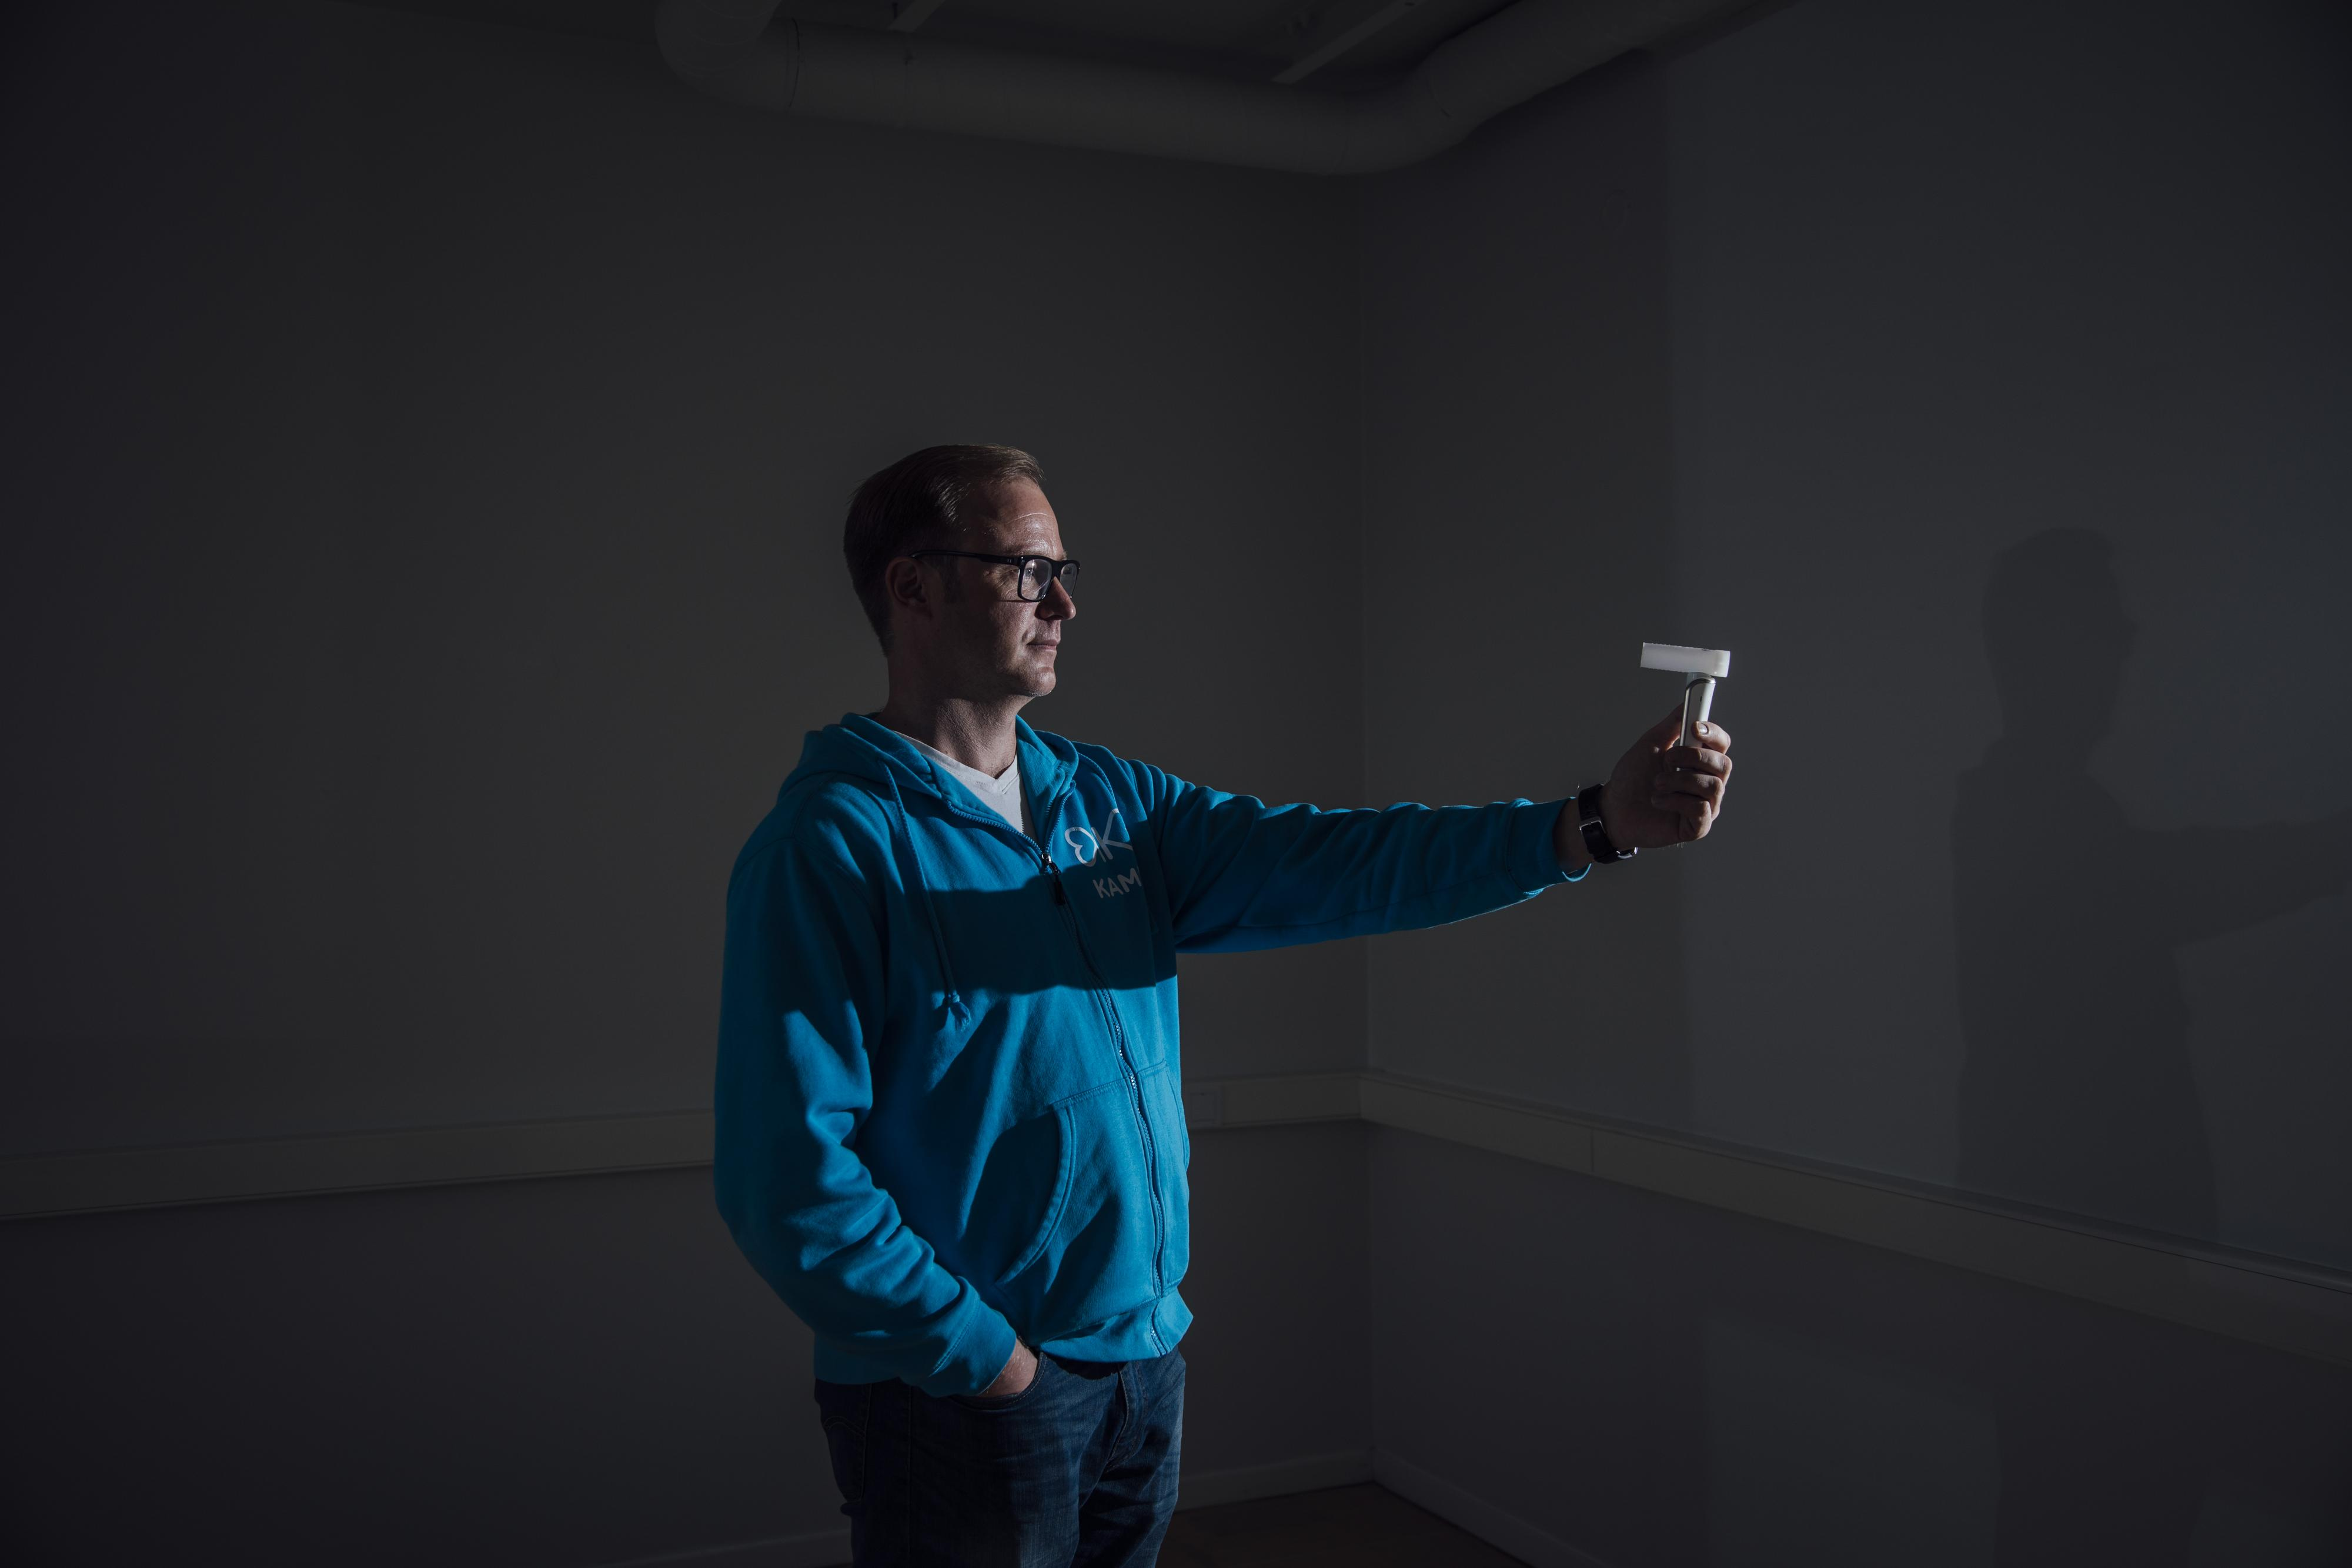 Kamu Health's mobile app from the Helsinki Smart Region aim to improve asthmatcis' life.